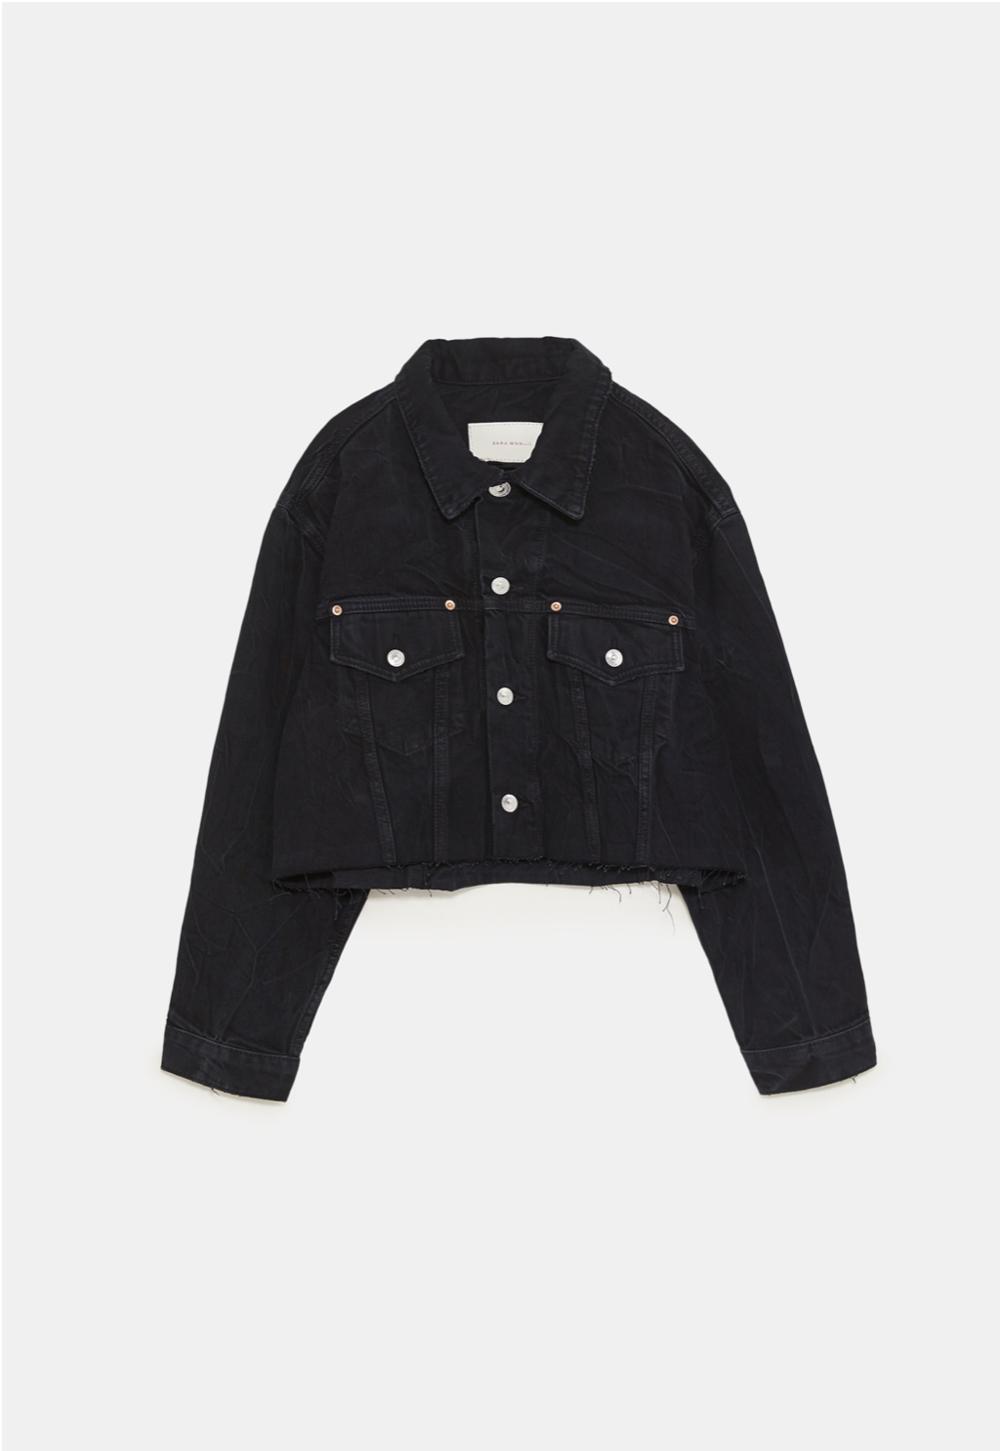 057aea96 Zara Sale: Coats & Jackets — New York City Lifestyle & Fashion ...